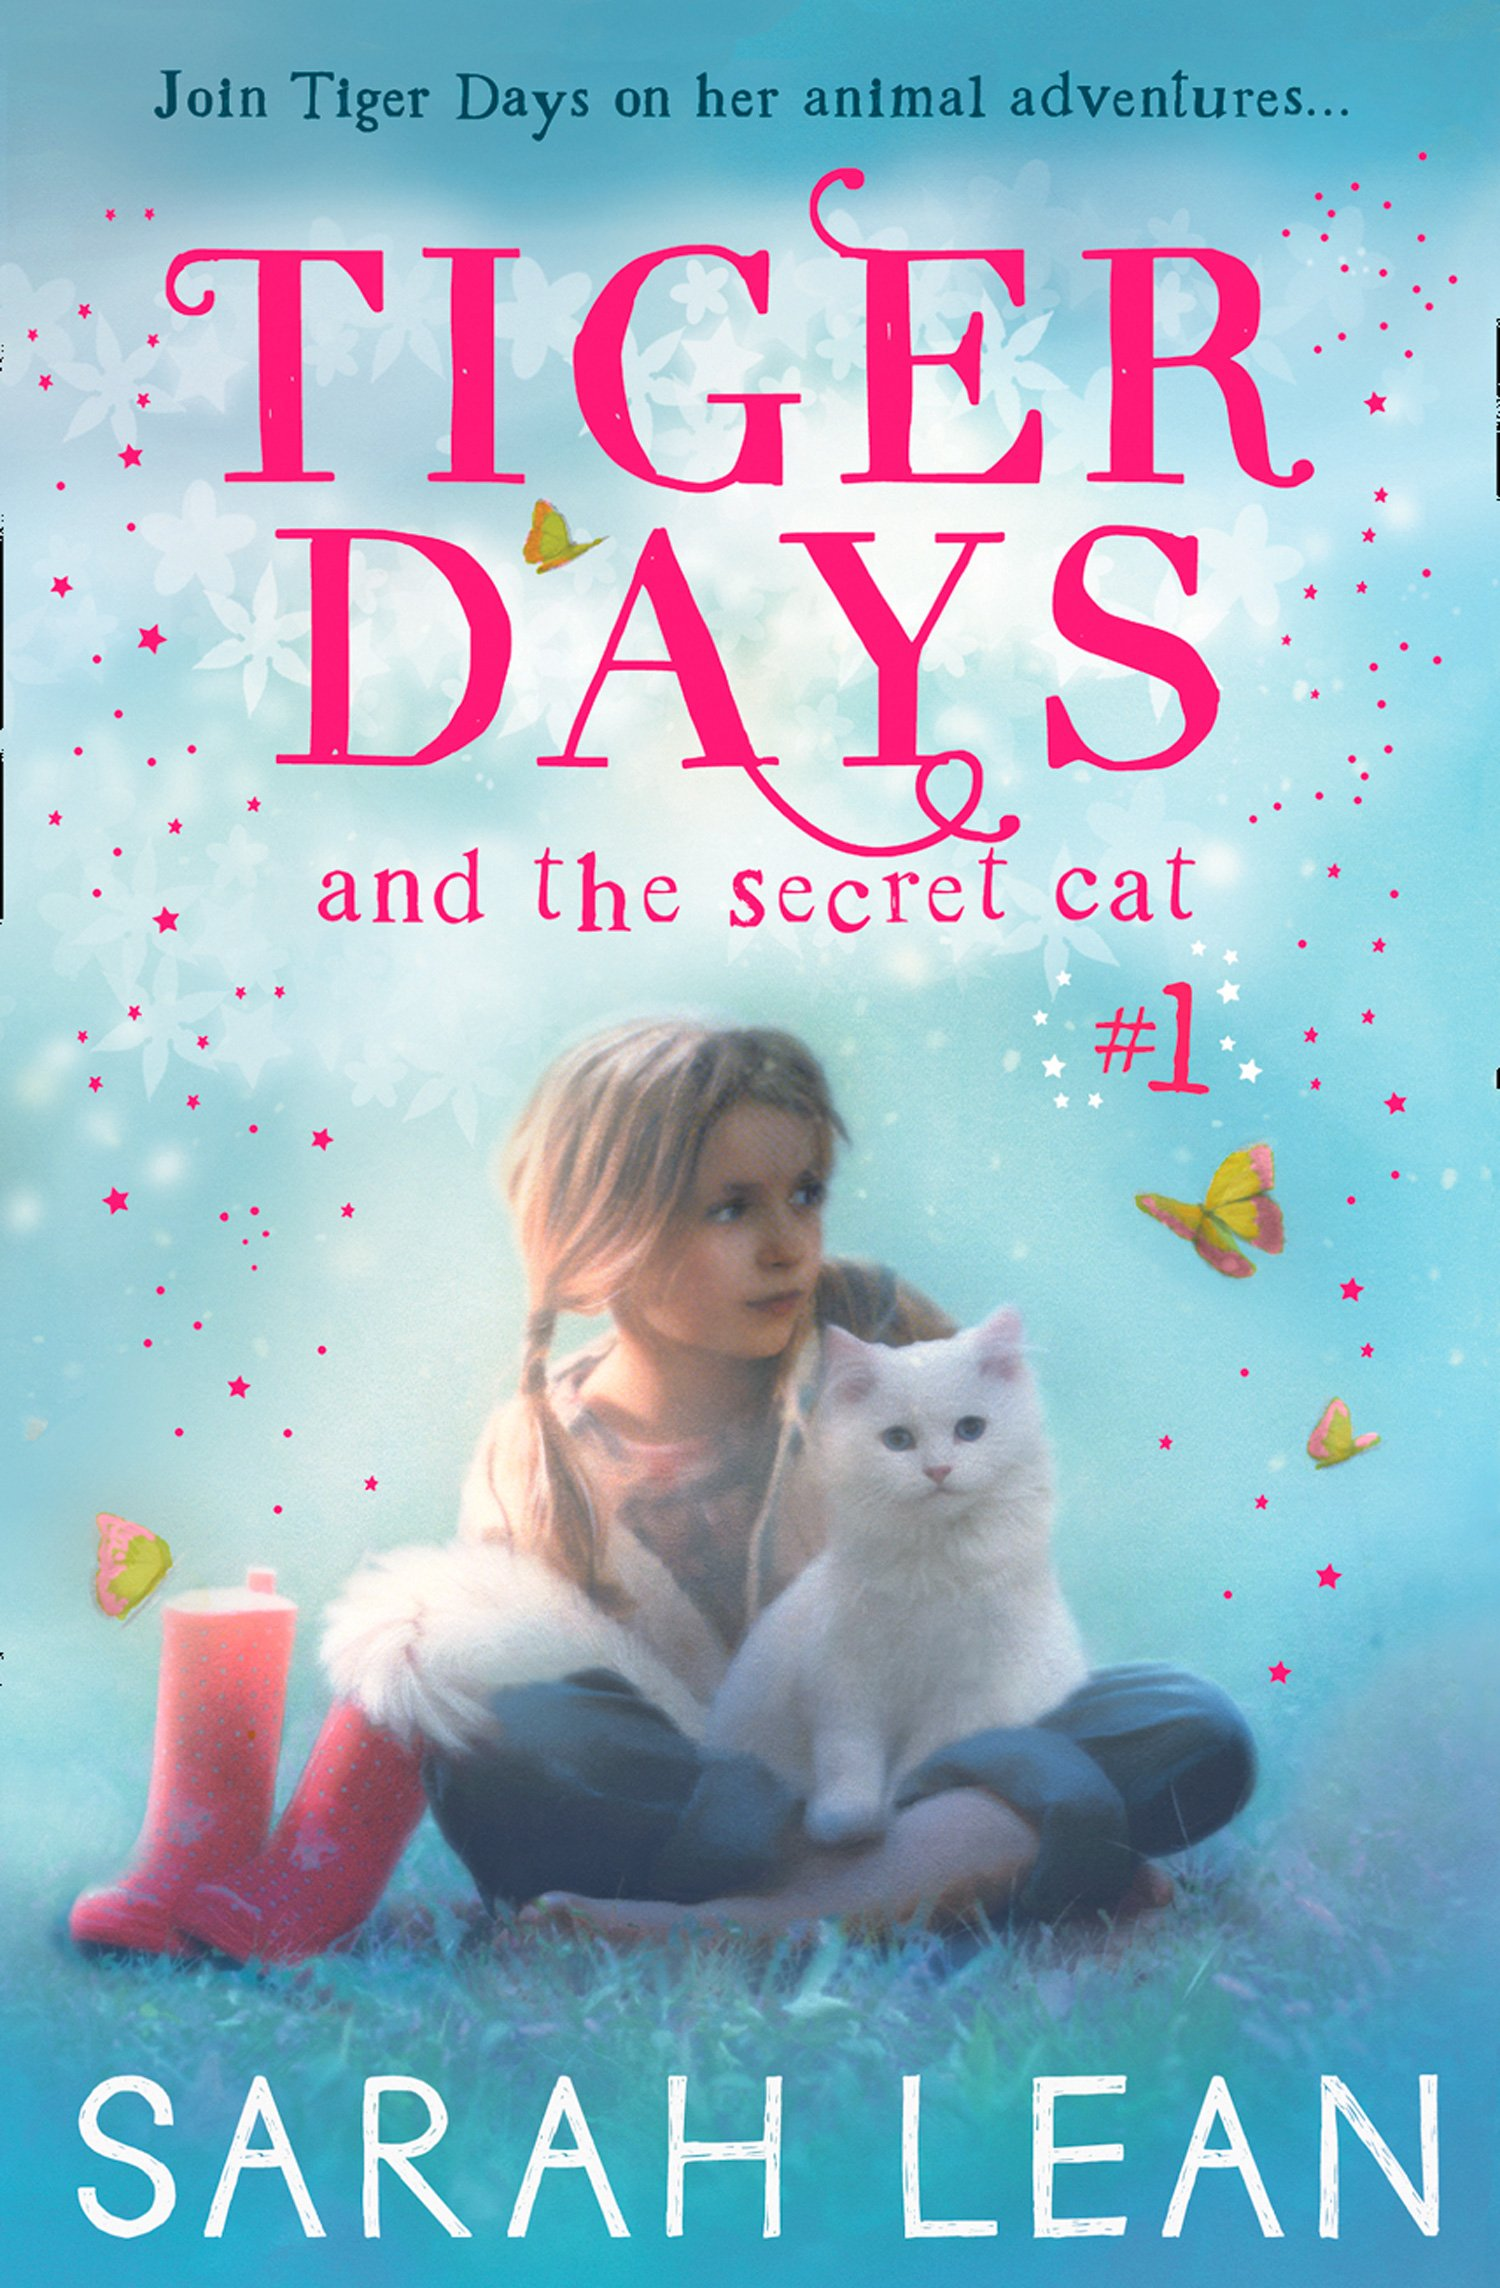 Read Online The Secret Cat (Tiger Days, Book 1) ebook